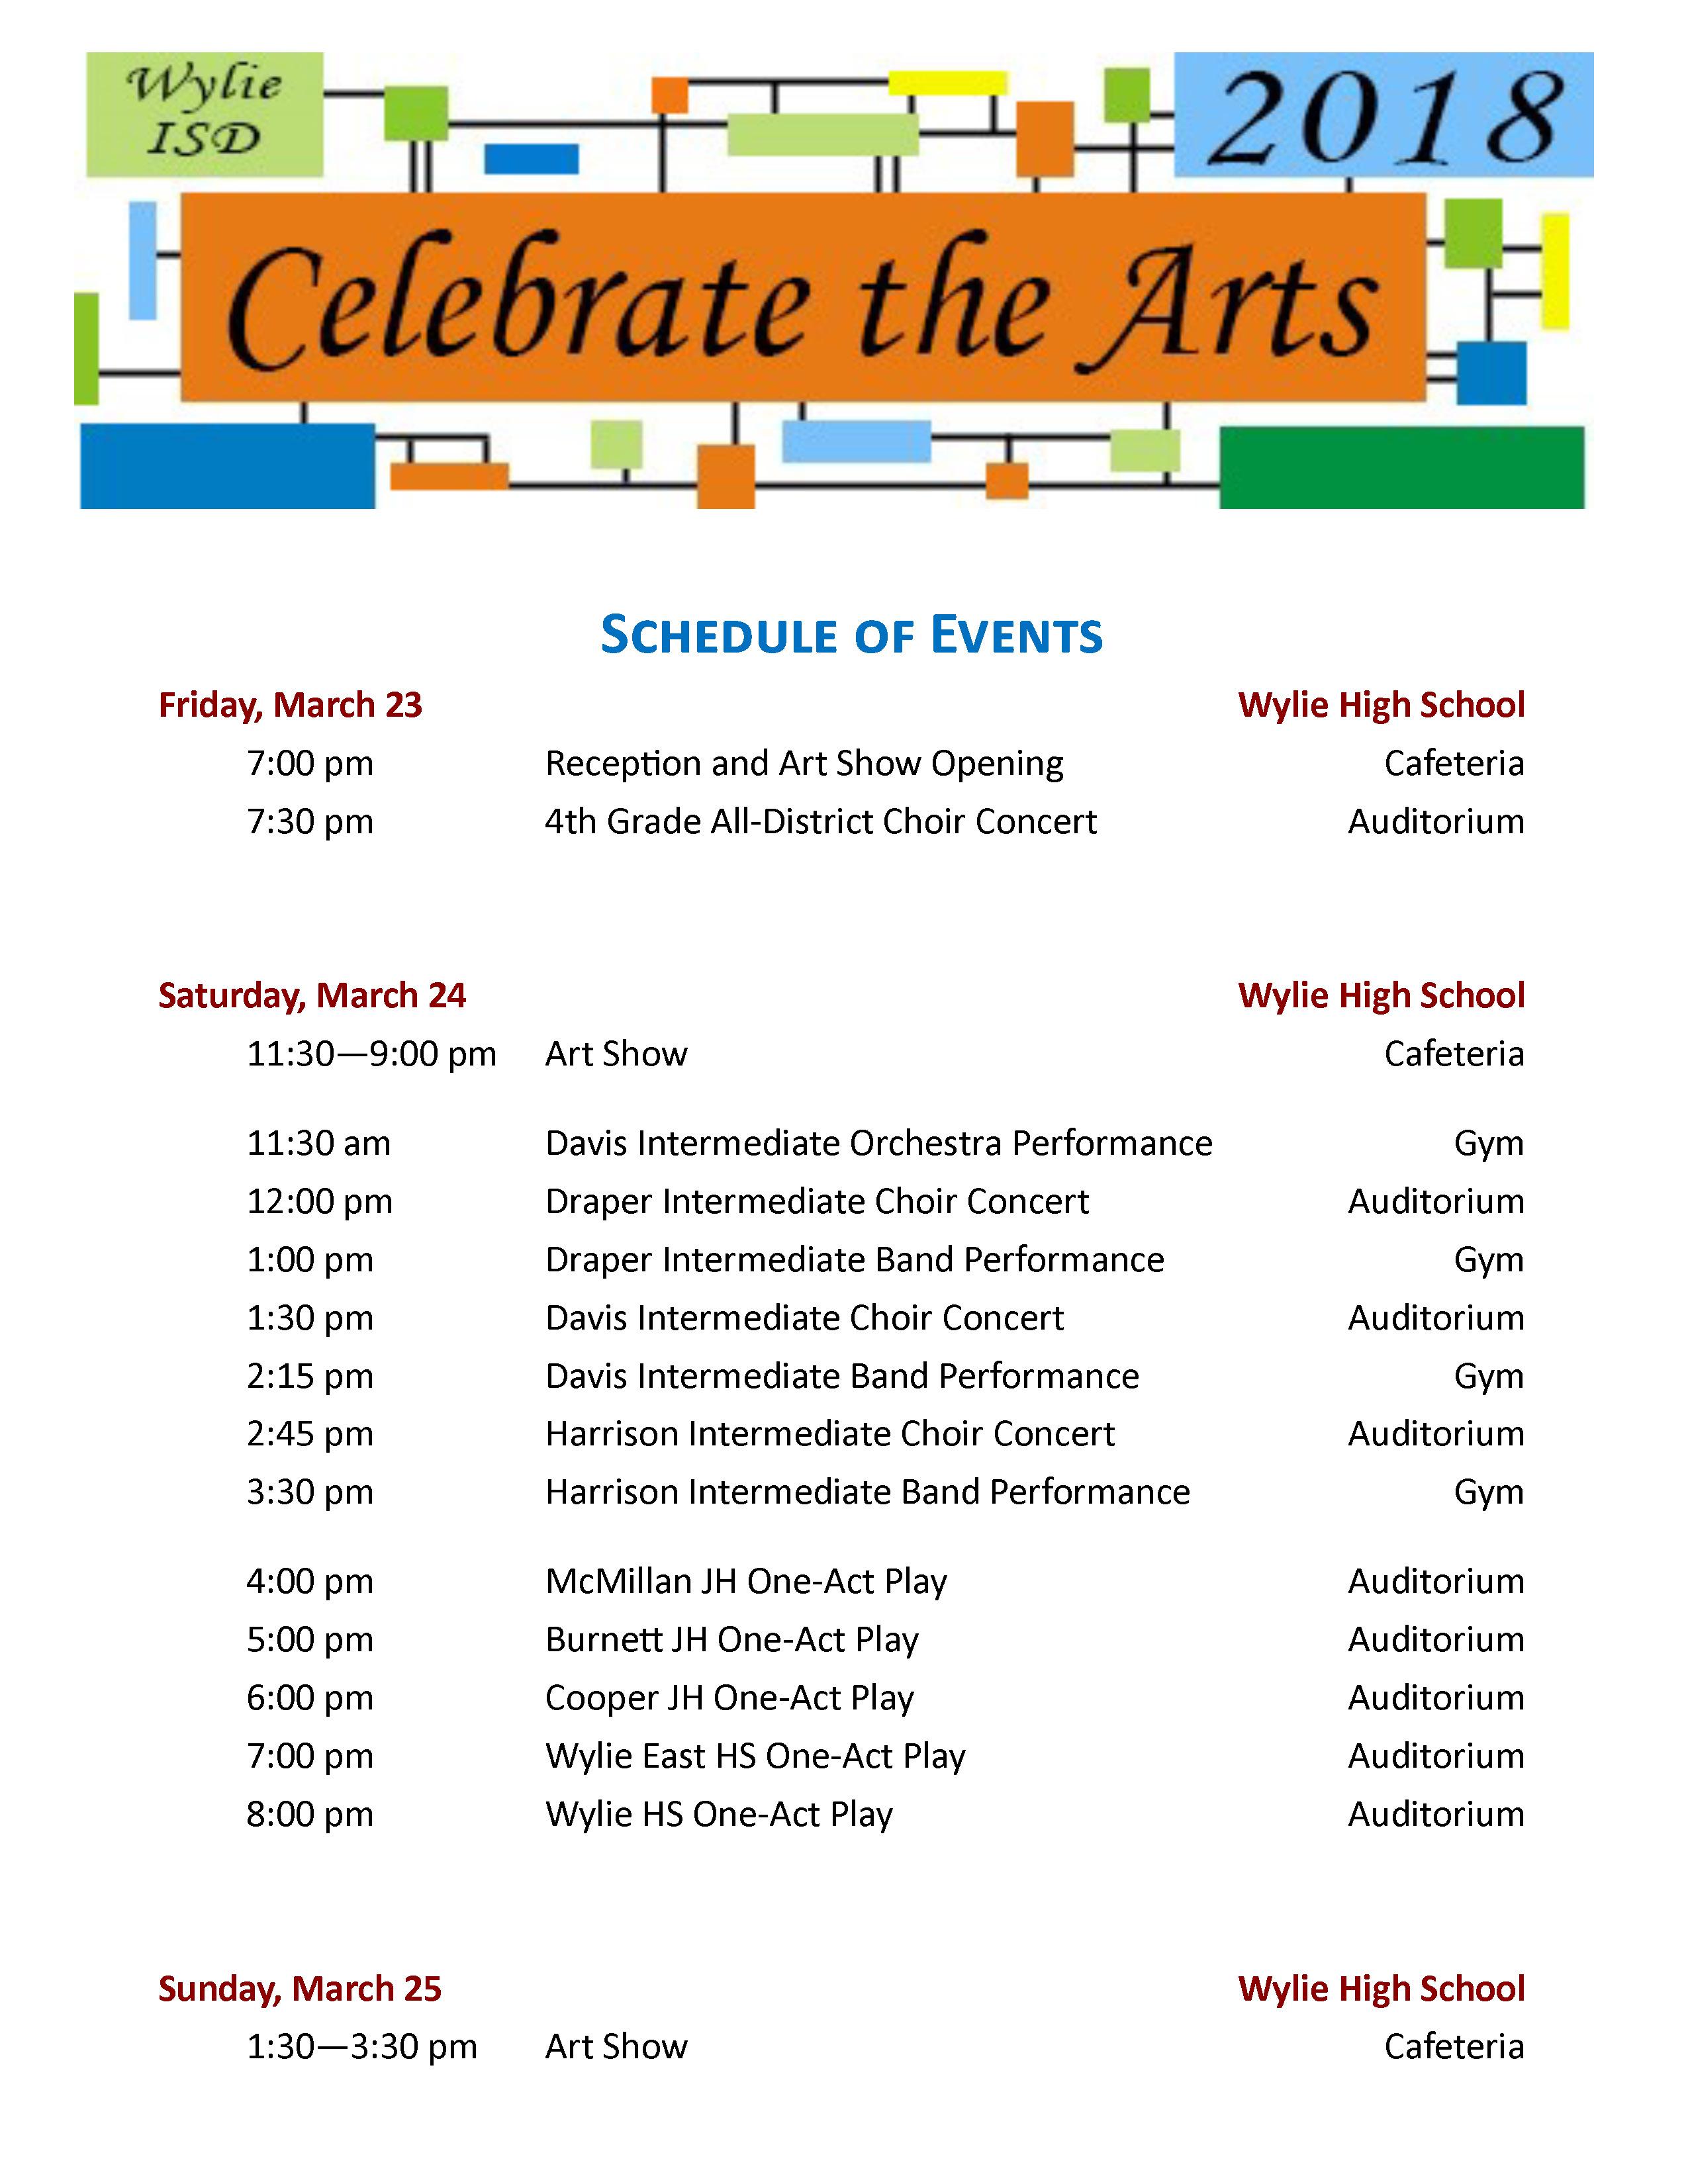 Fine Arts / Celebrate The Arts Calendar